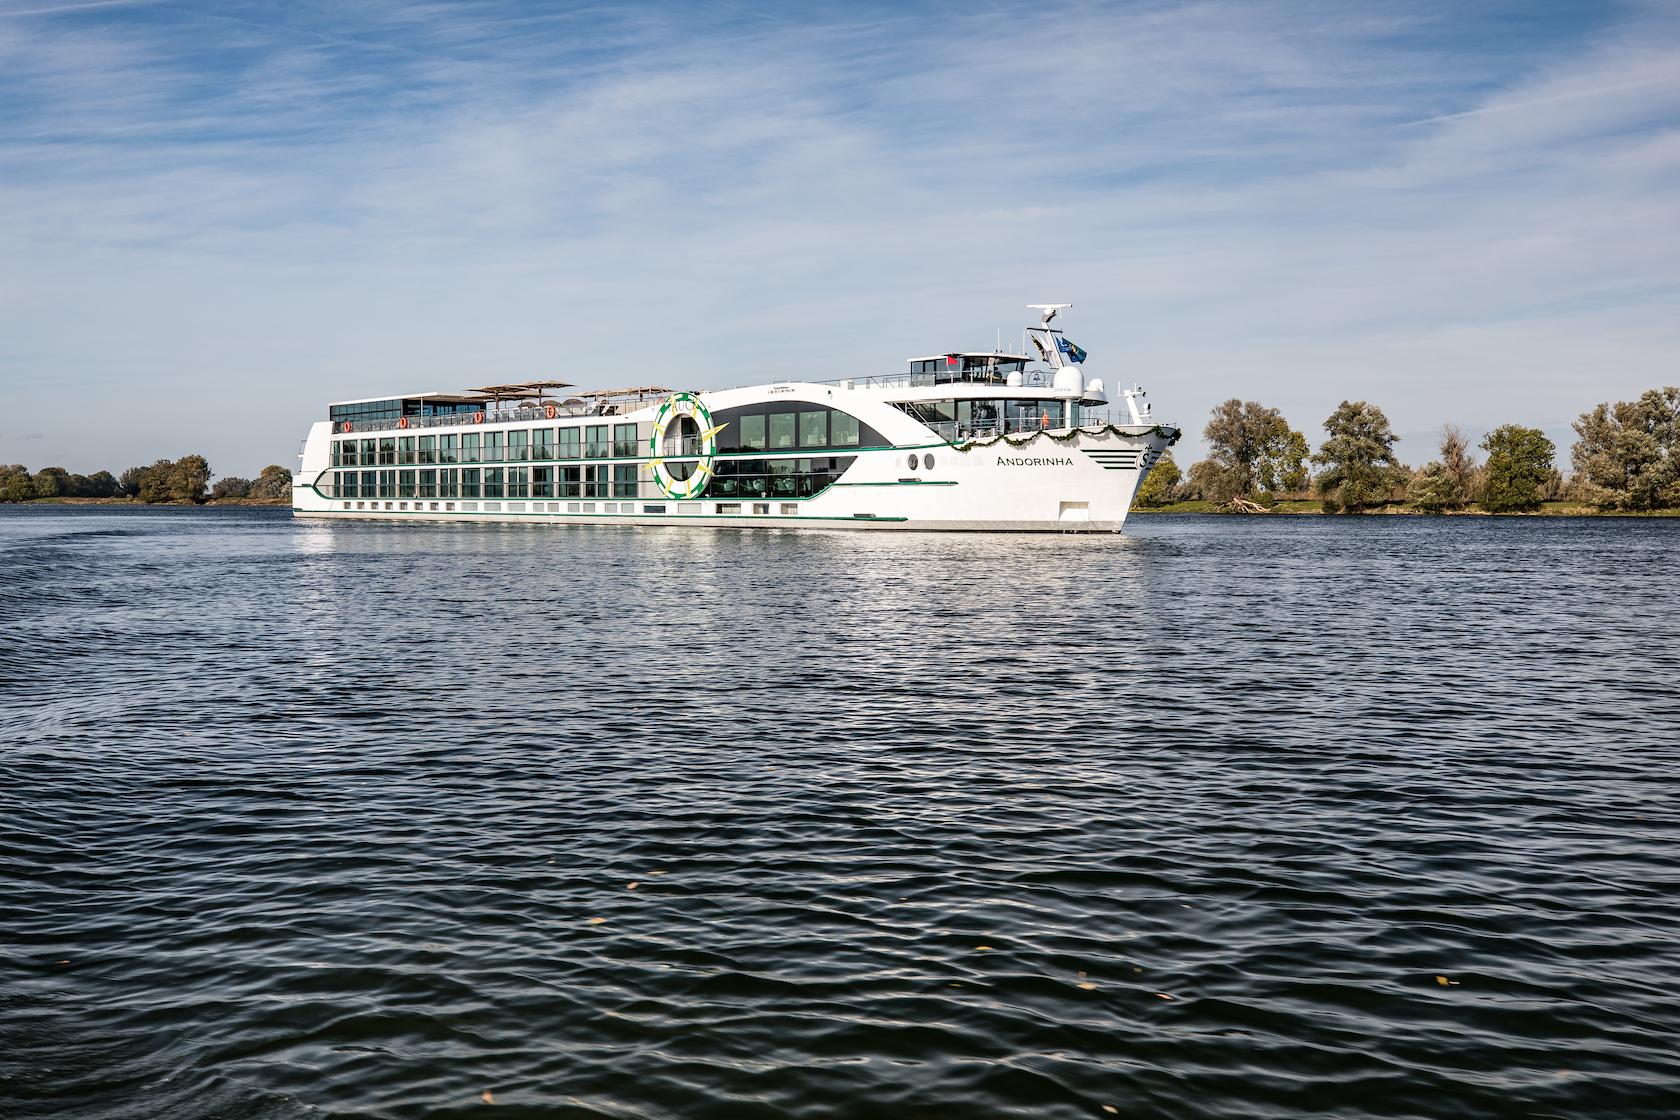 MS ANDORINHA VIVA Cruises